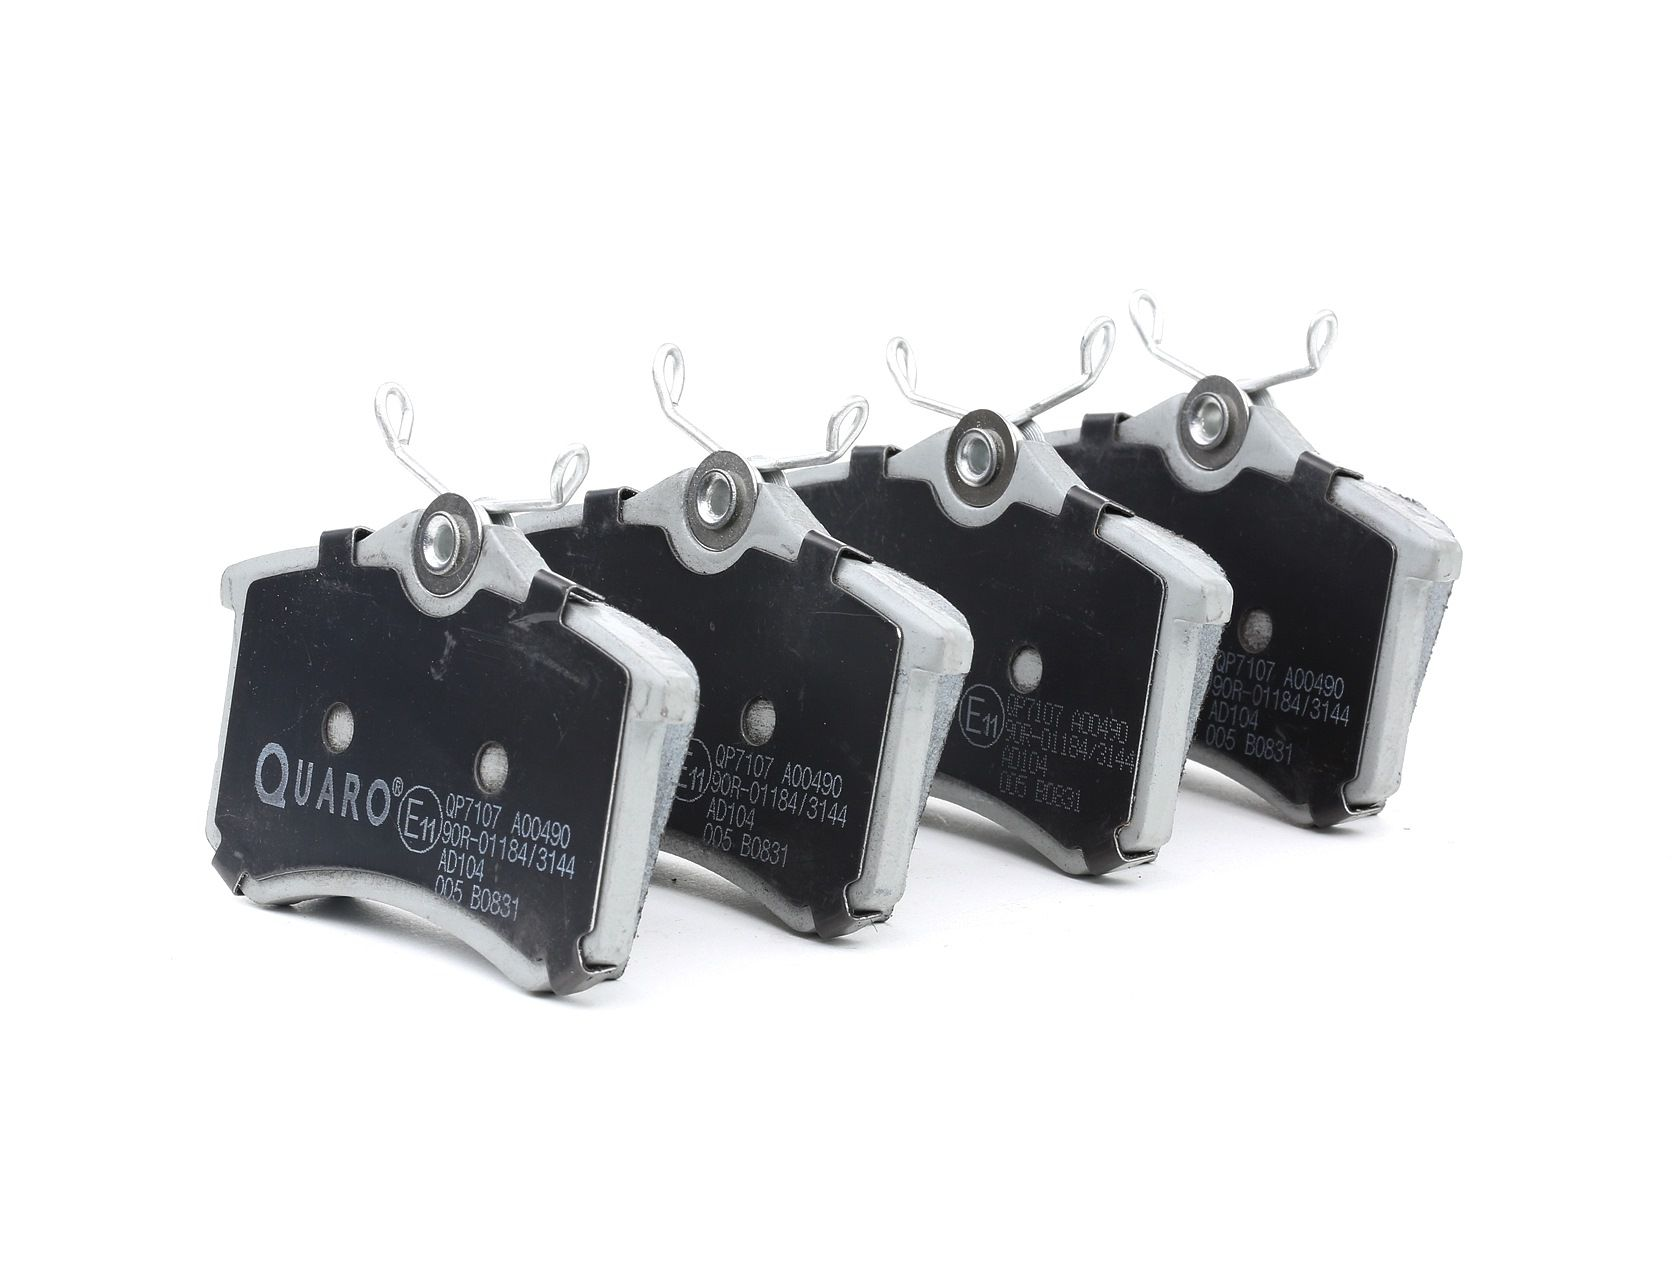 Bremsbelagsatz QUARO QP7107 Bewertung